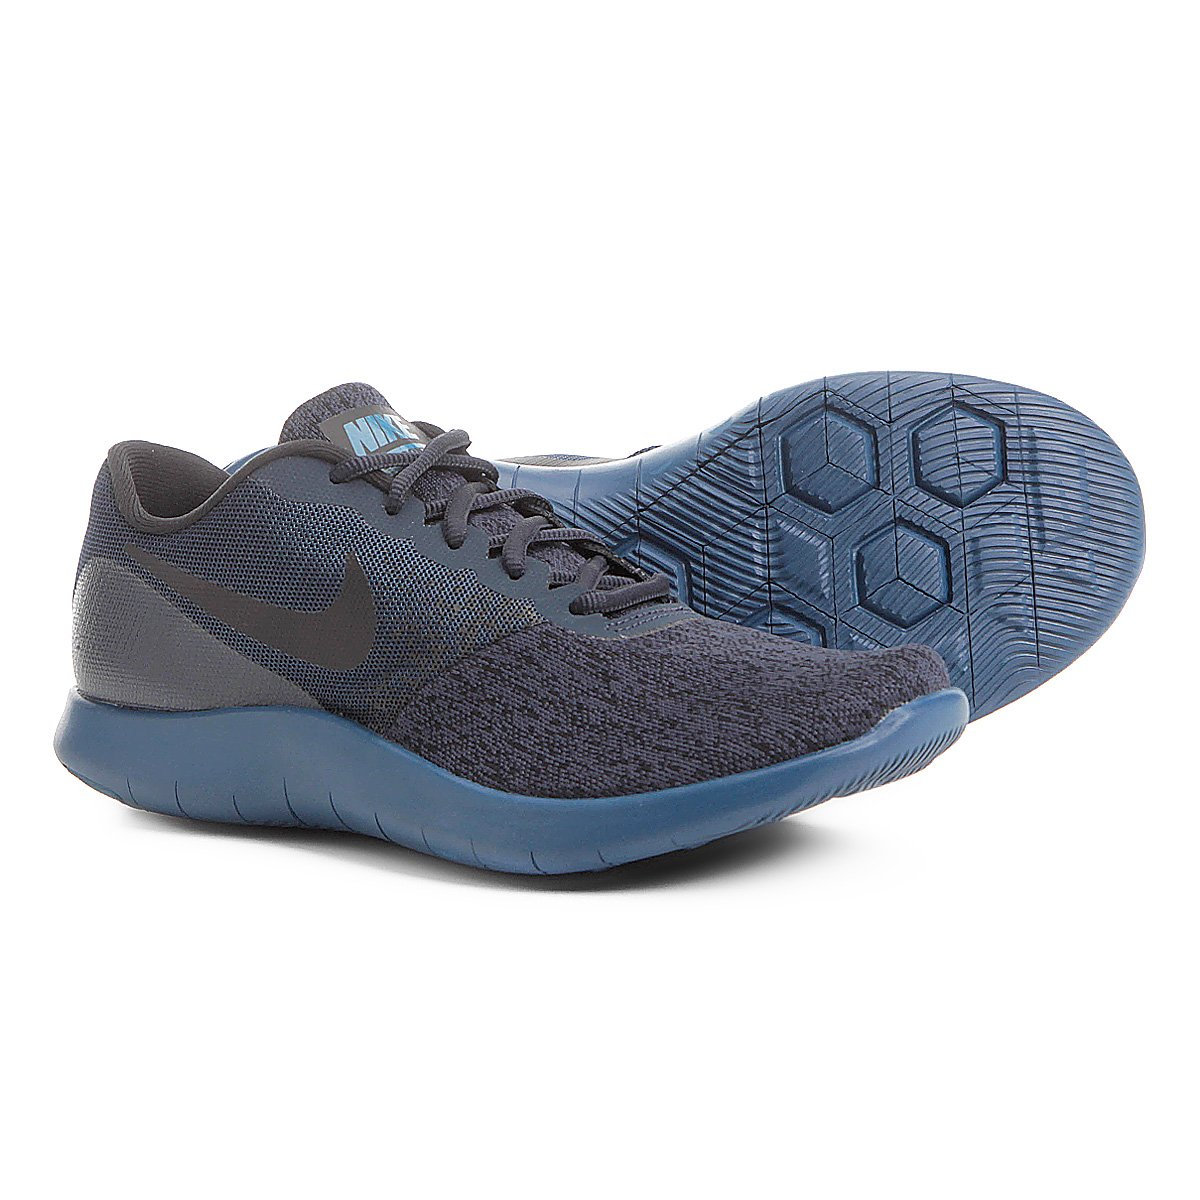 Tênis Nike Flex Nike e Feminino Contact Preto Flex Azul Tênis rfrUvqxwZ